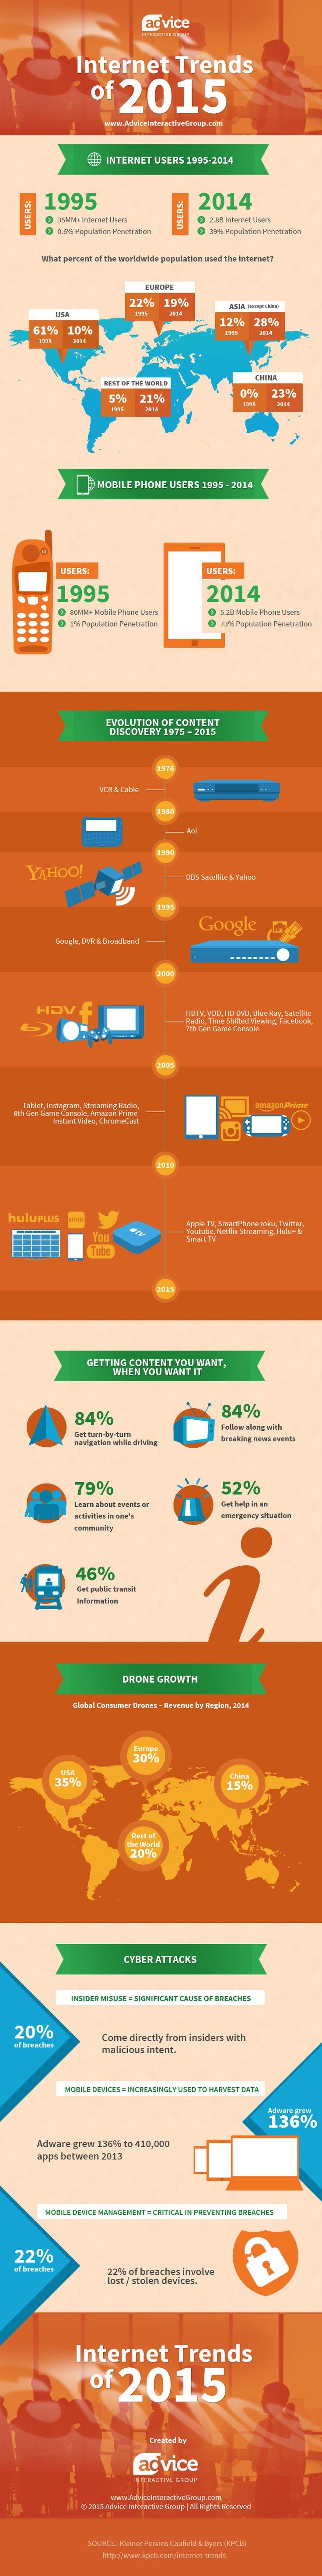 KPCB Internet Trends 2015 Infographic